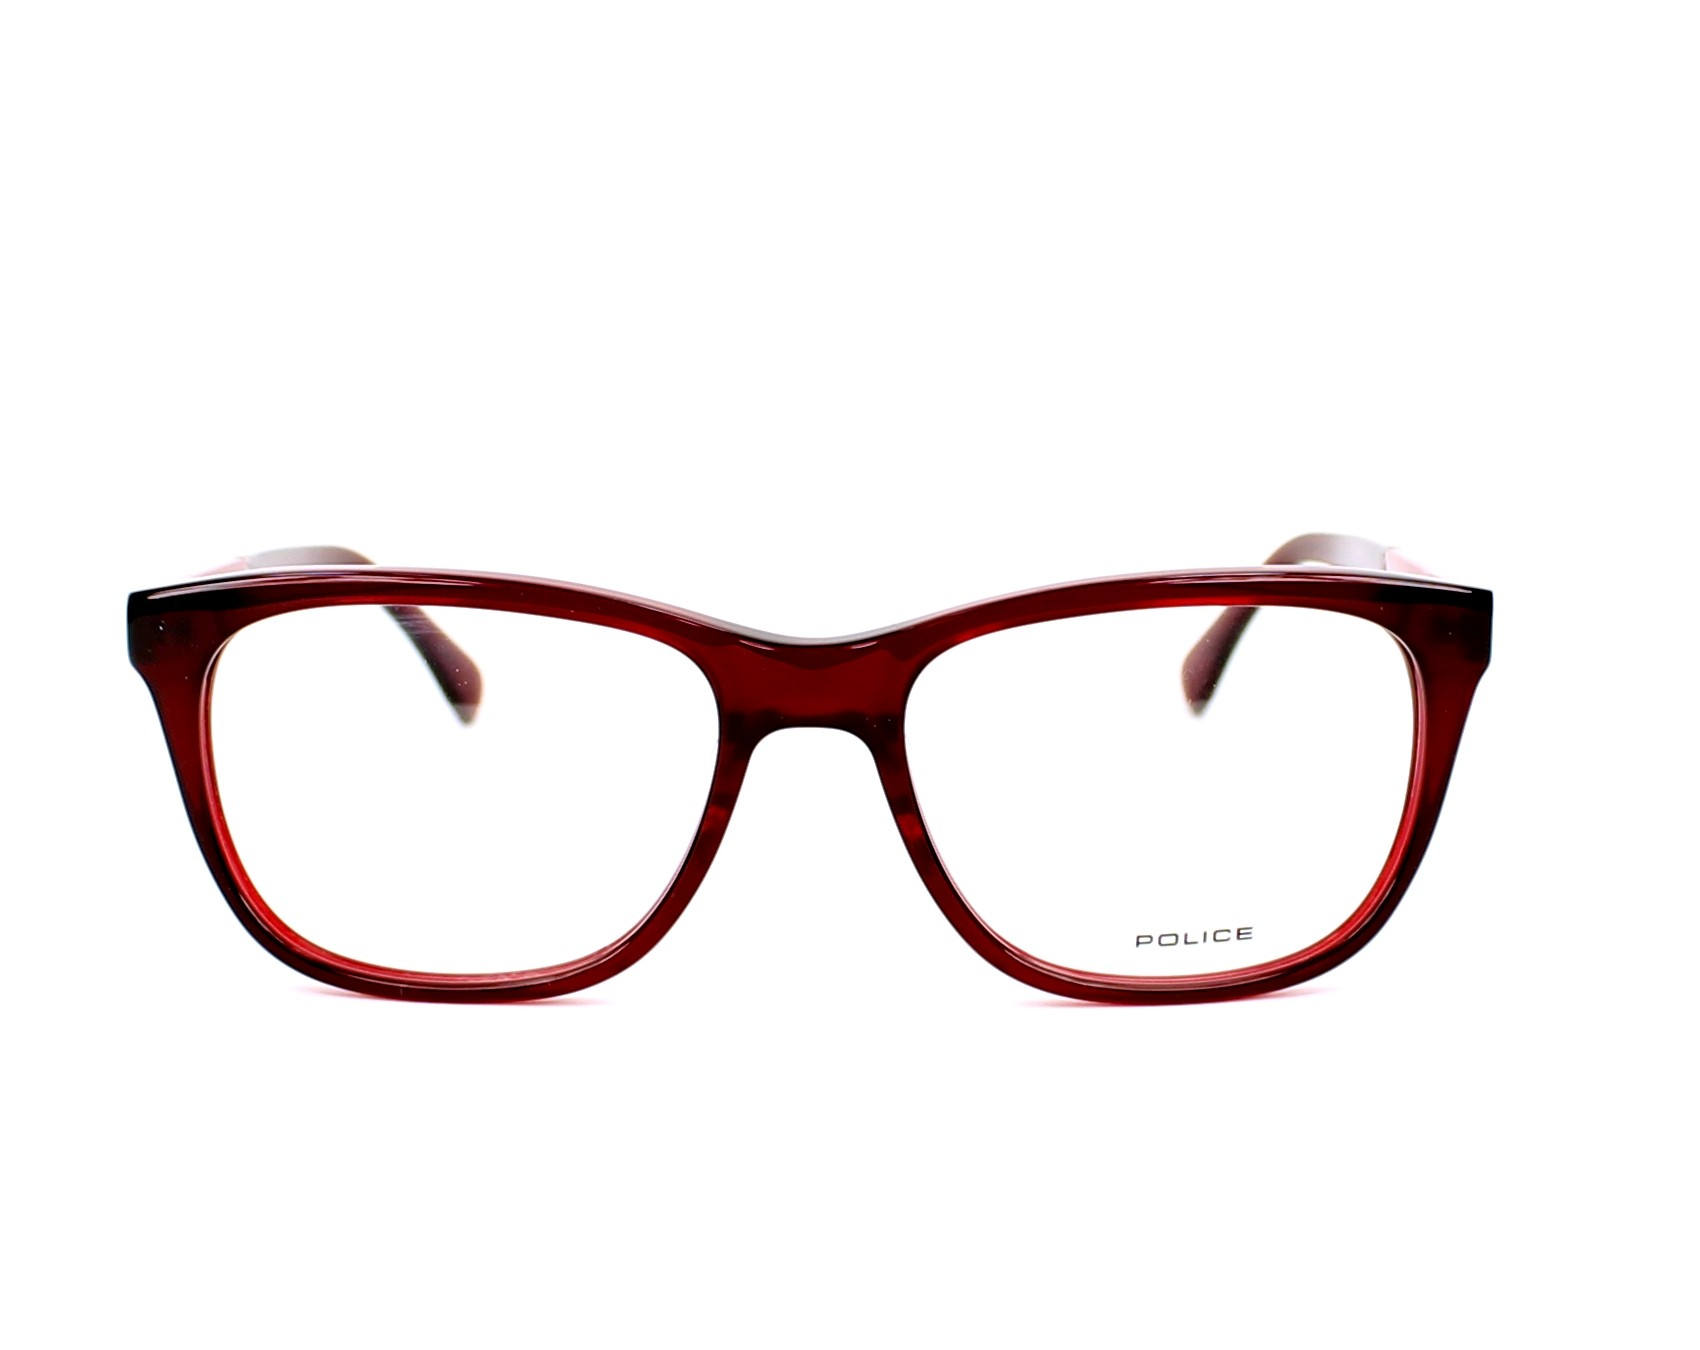 eb795244e4 Two Pd Numbers On Eyeglasses Prescription